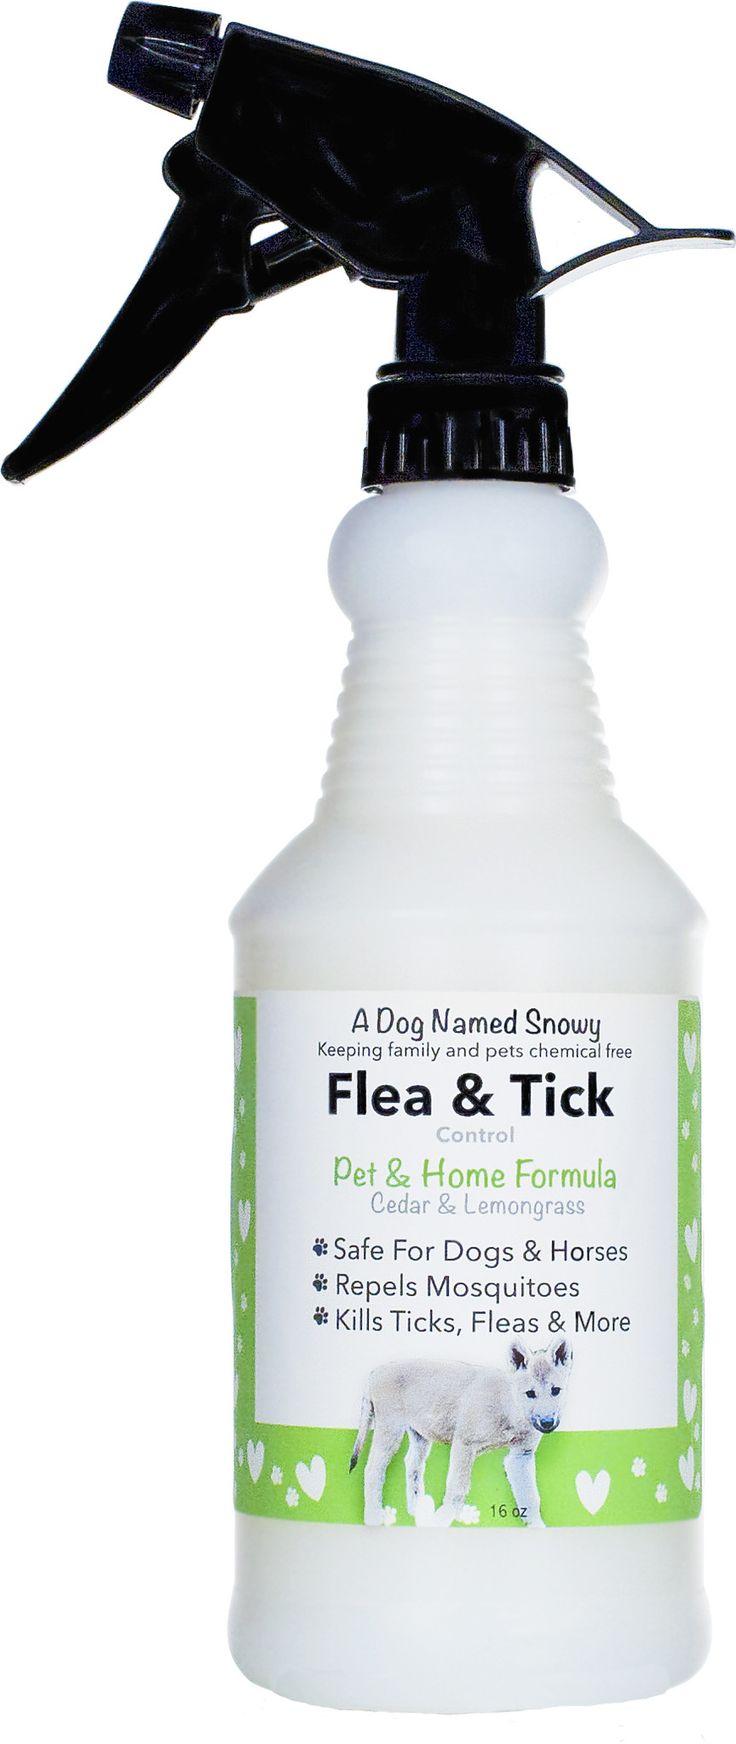 All Natural Flea & Tick Spray